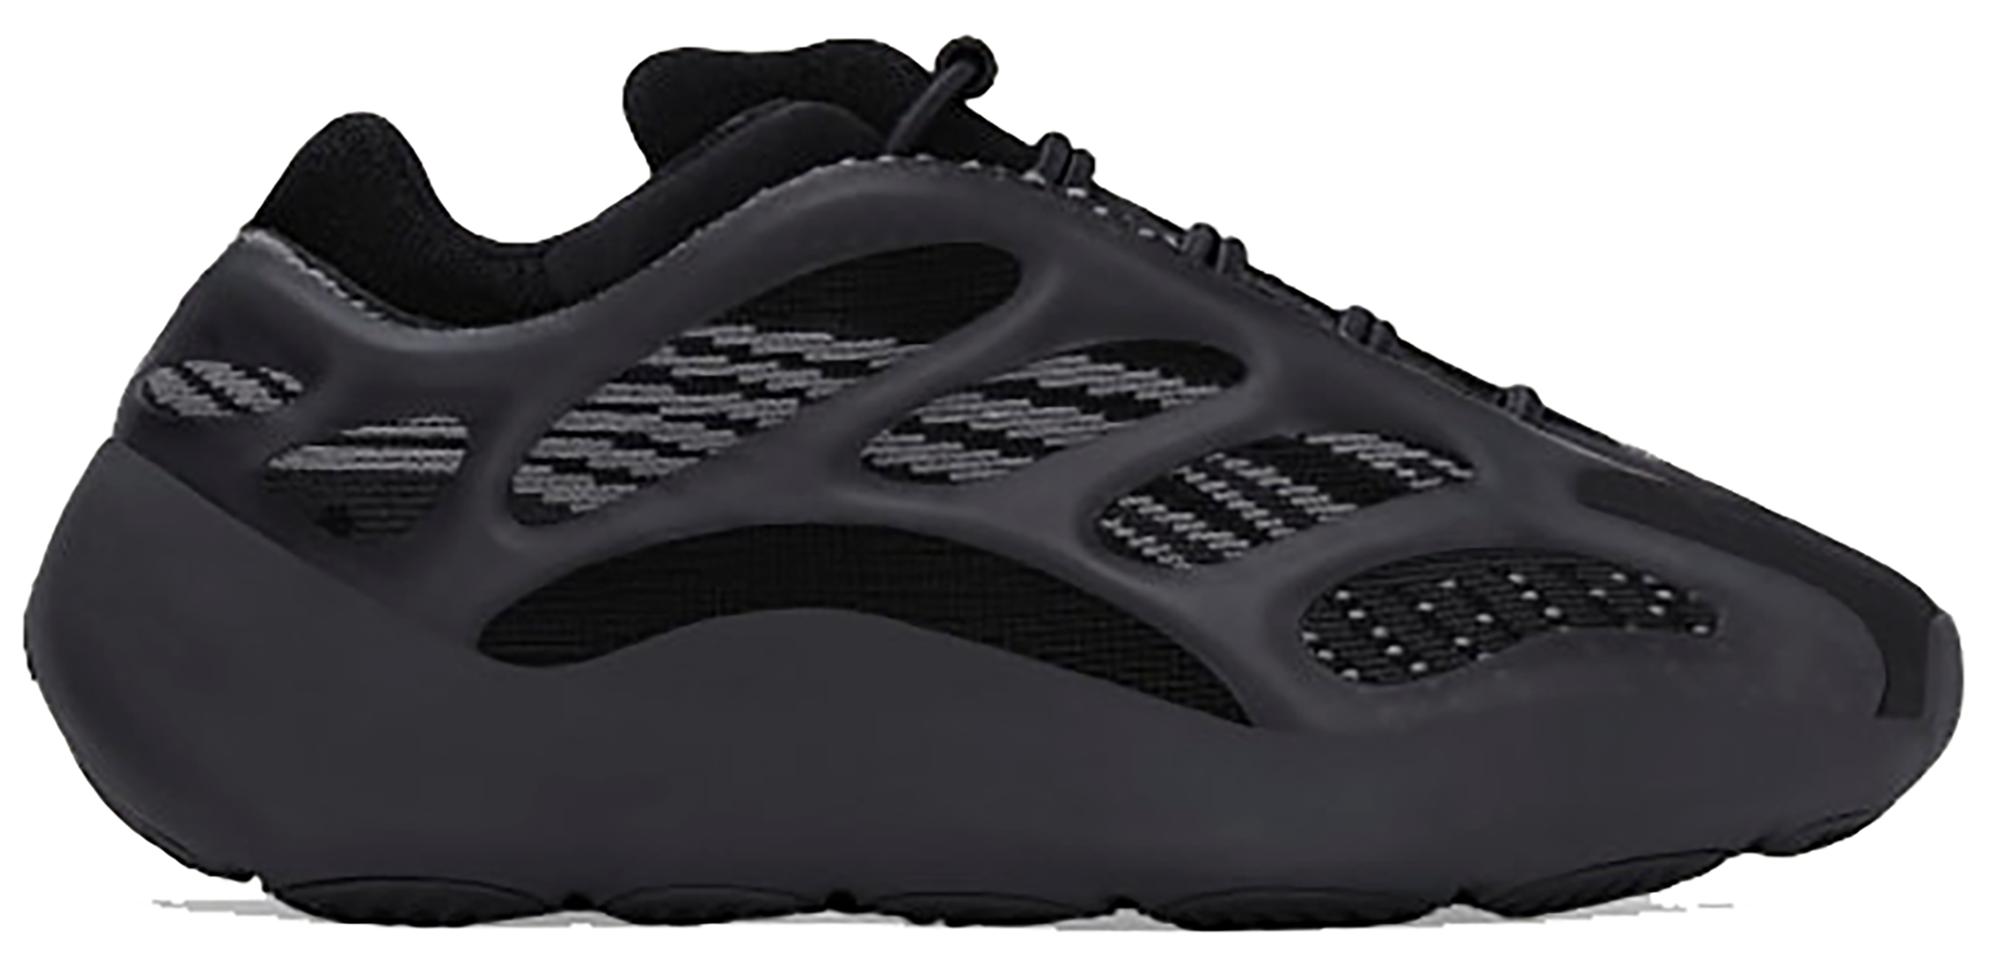 adidas Yeezy 700 V3 Alvah (Kids) - H67800